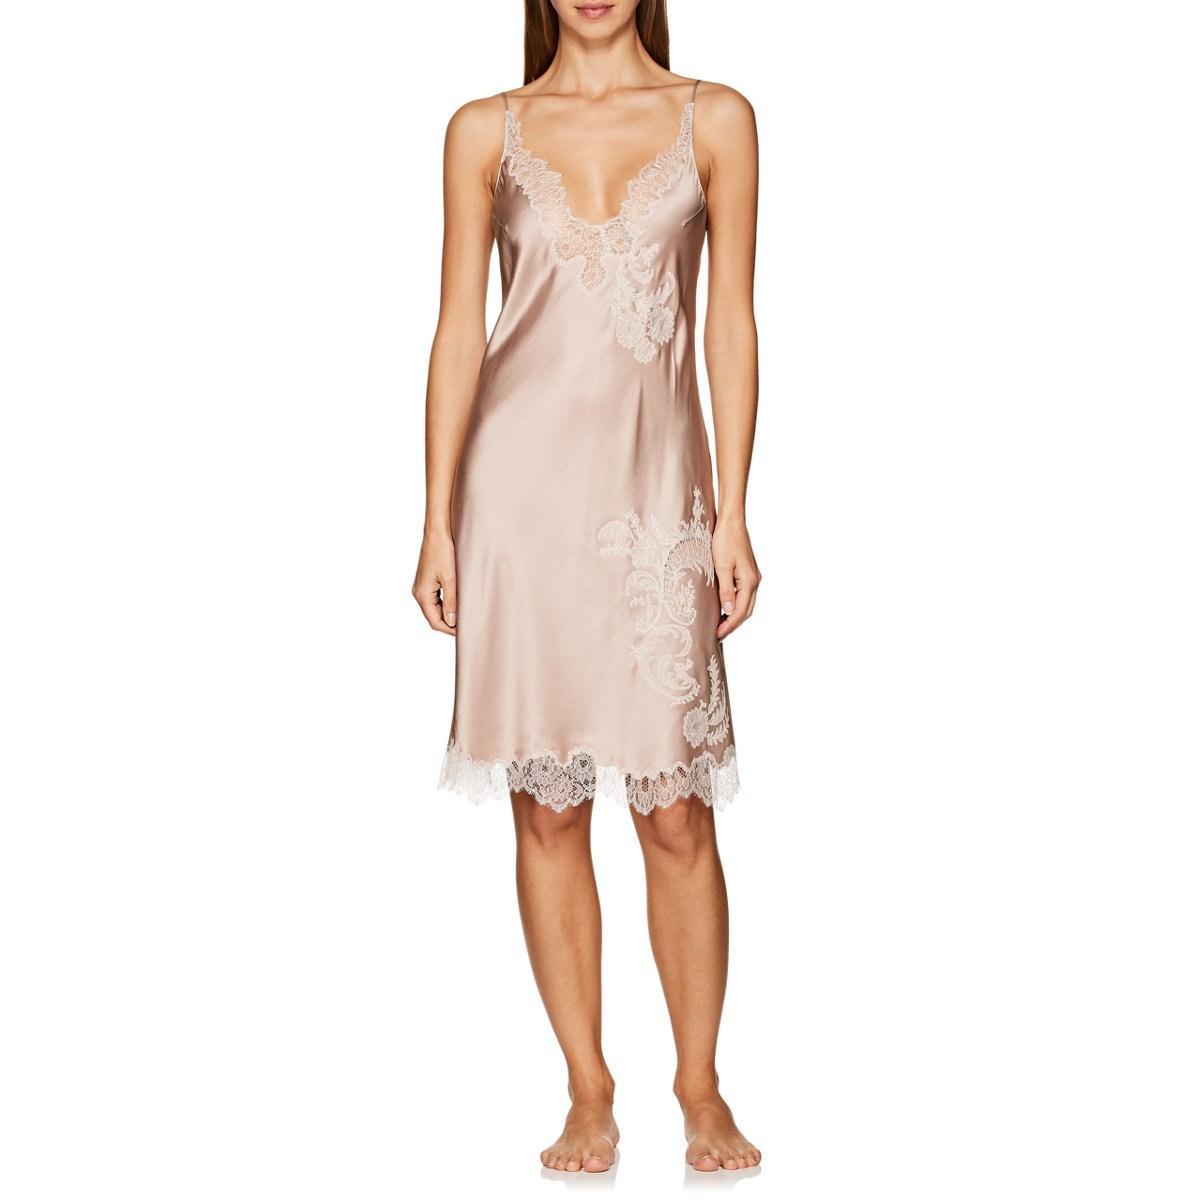 de7c5e6e0092c Carine Gilson Lace-trimmed Silk Chemise in Pink - Lyst